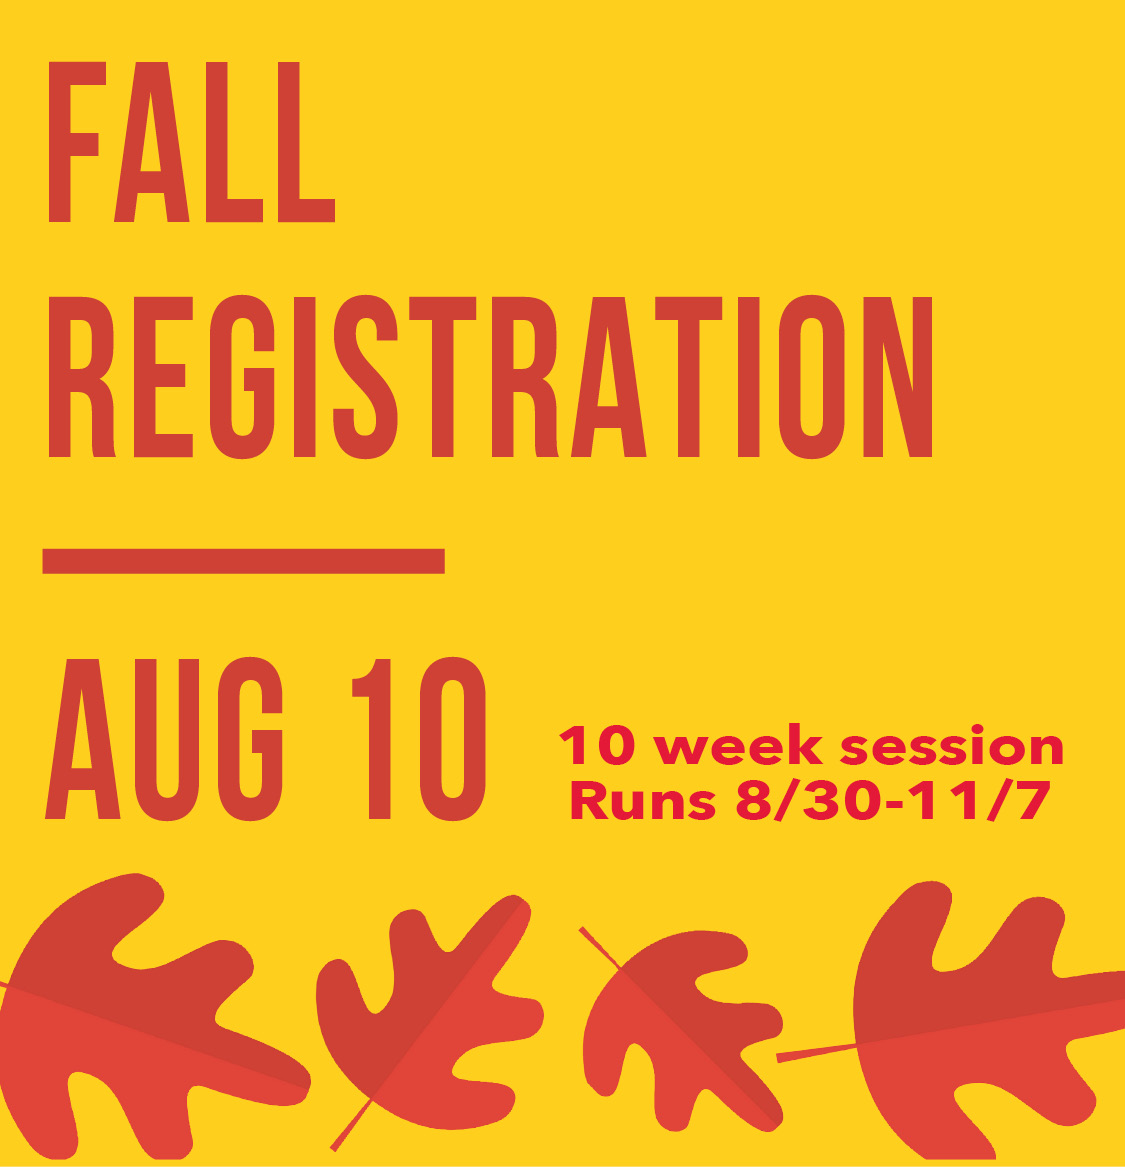 Fall Registration August 10